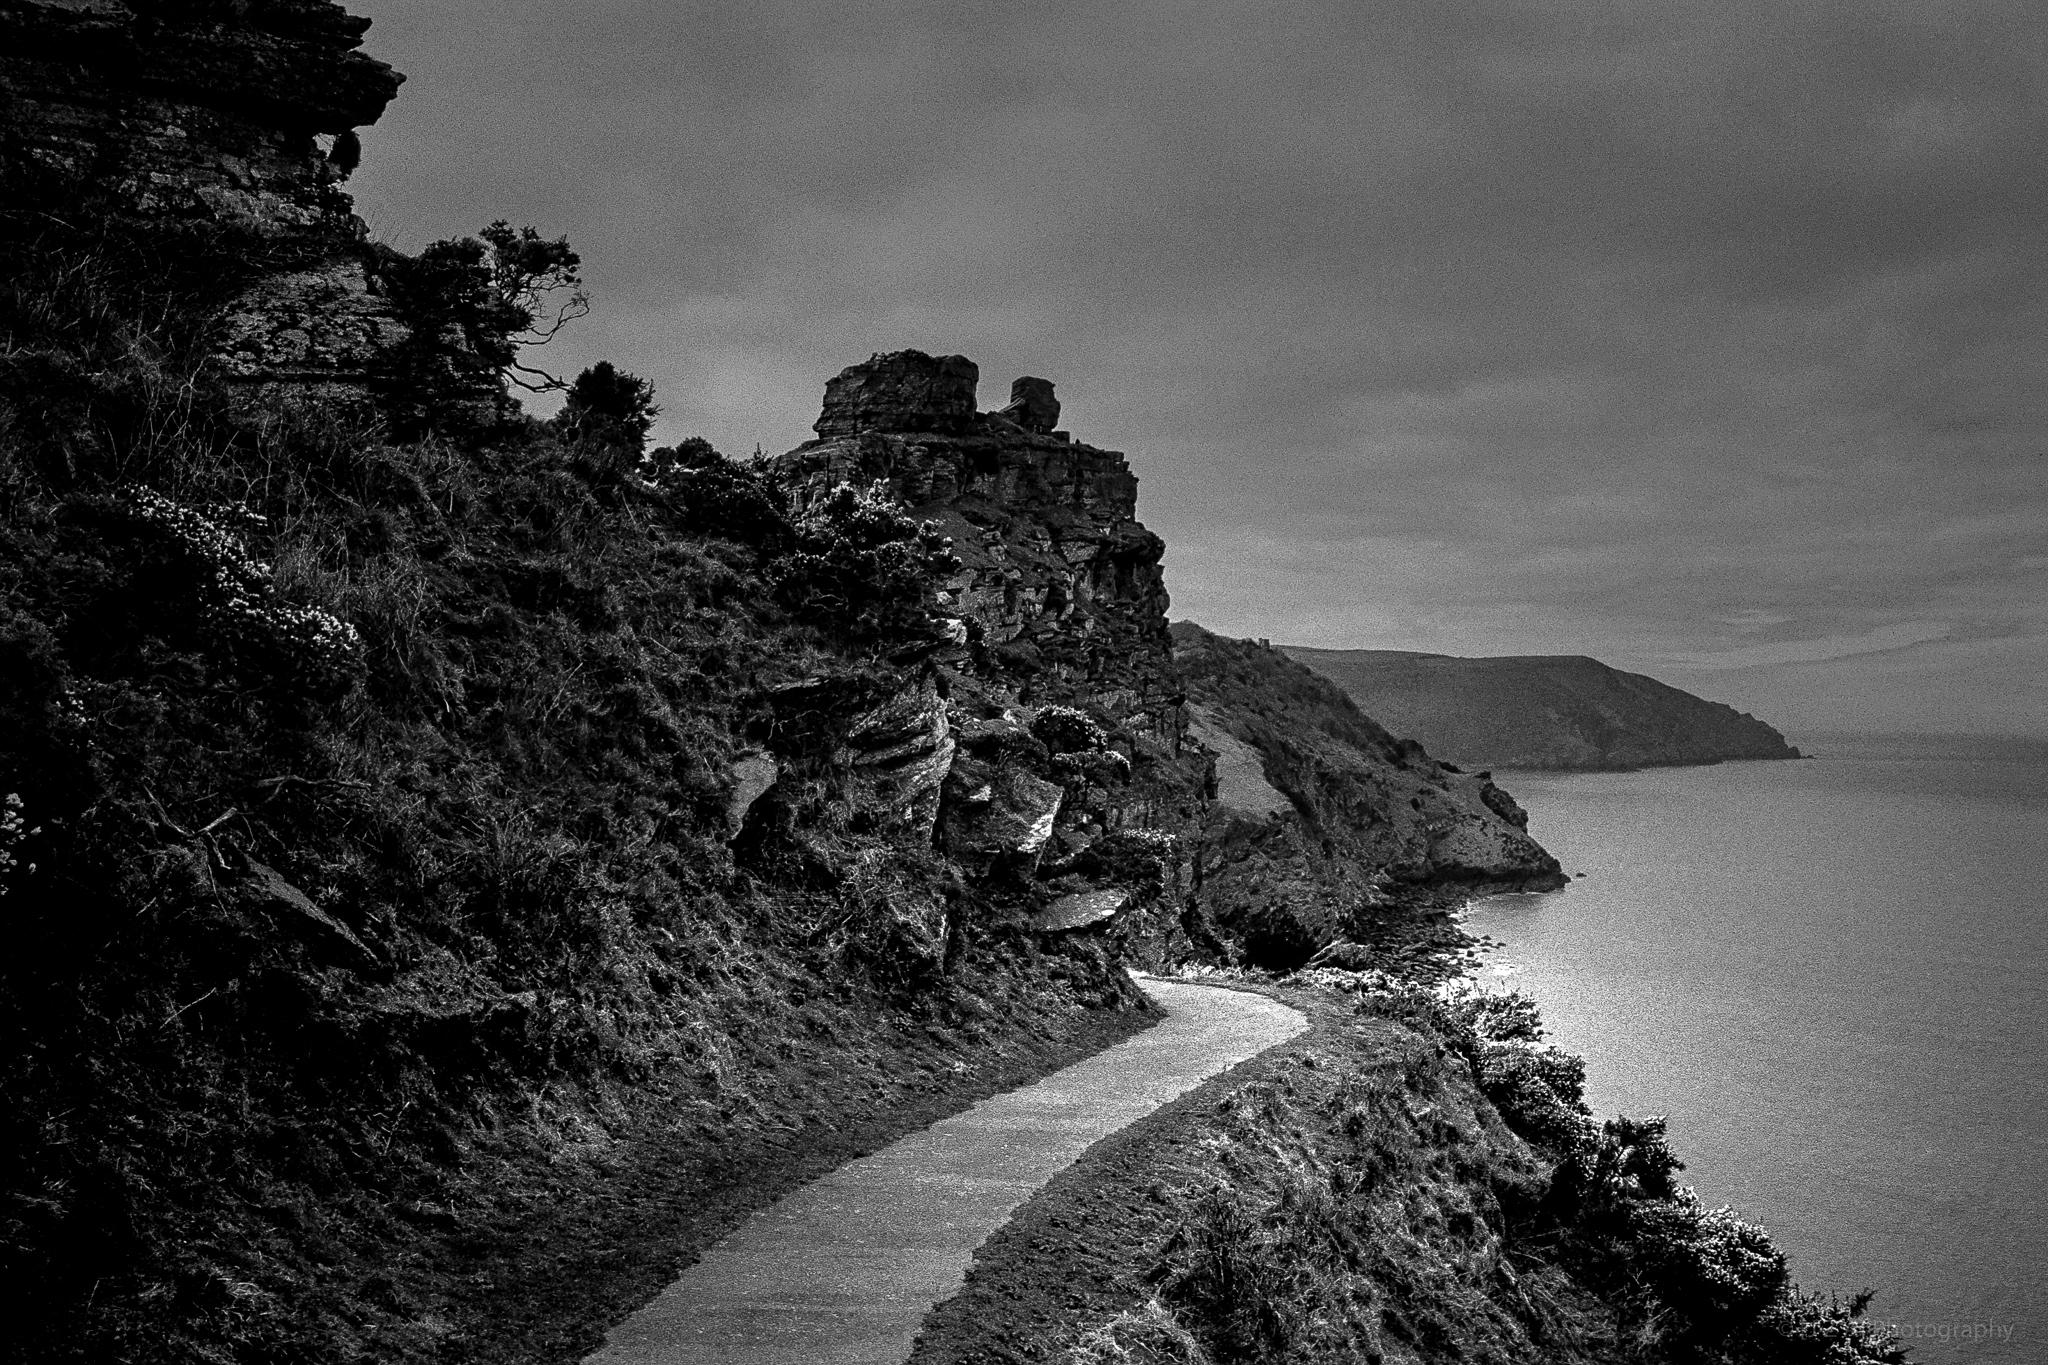 Photo taken by James Attree.